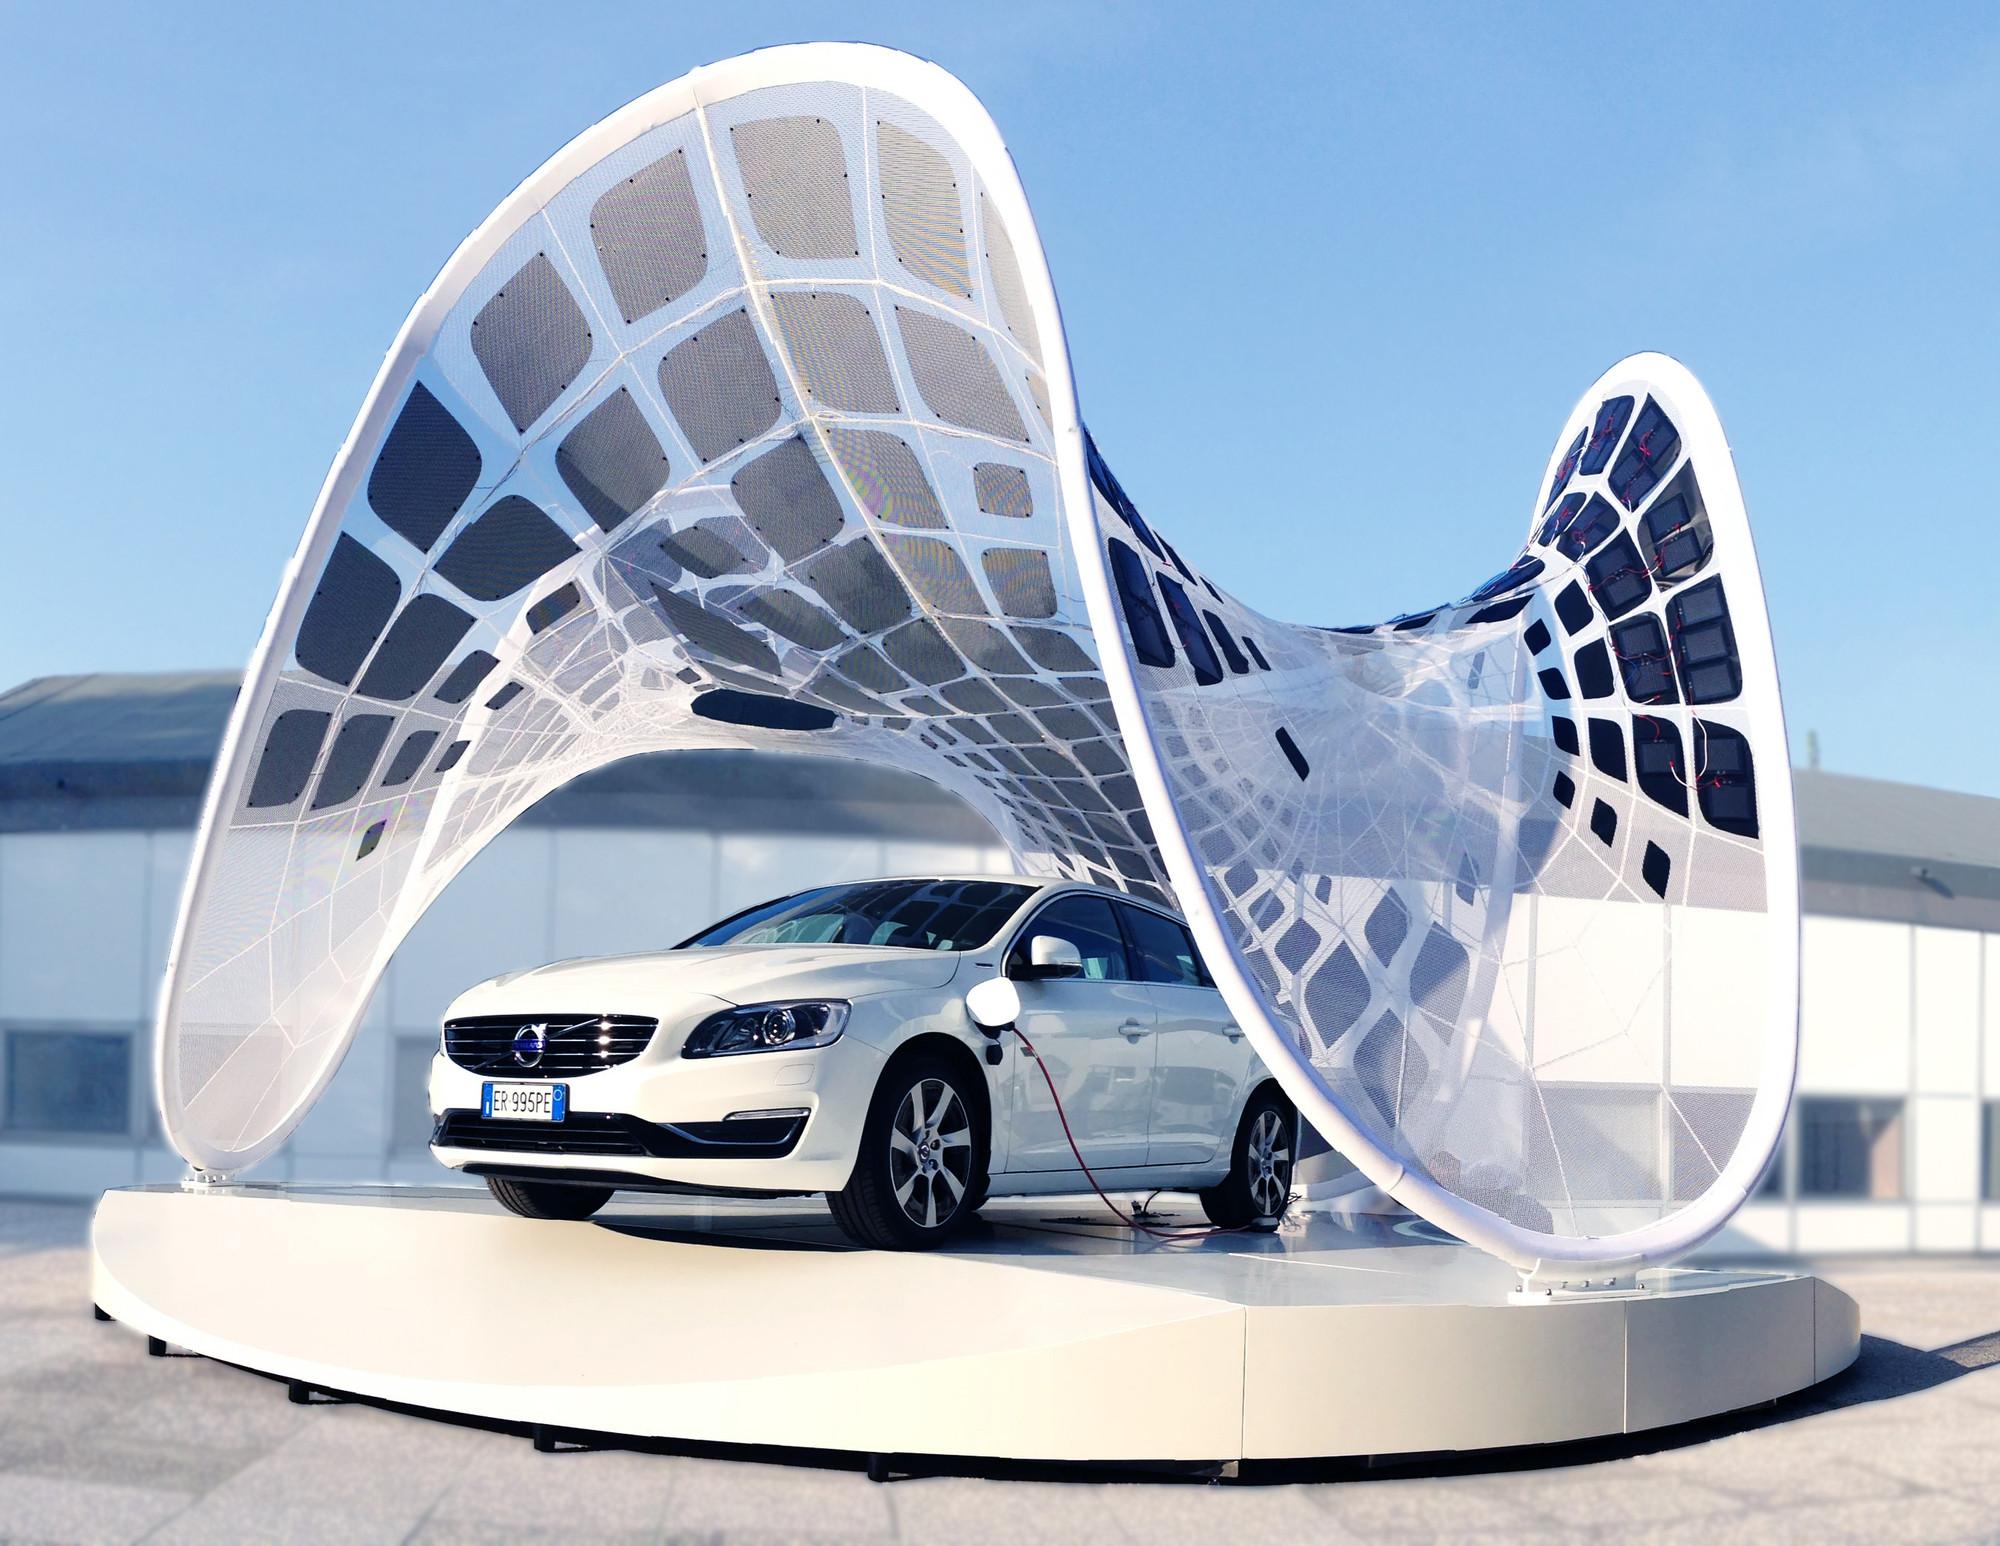 SDA + Volvo Collaborate to Create Portable Car-Charging Pavilion, Courtesy of SDA